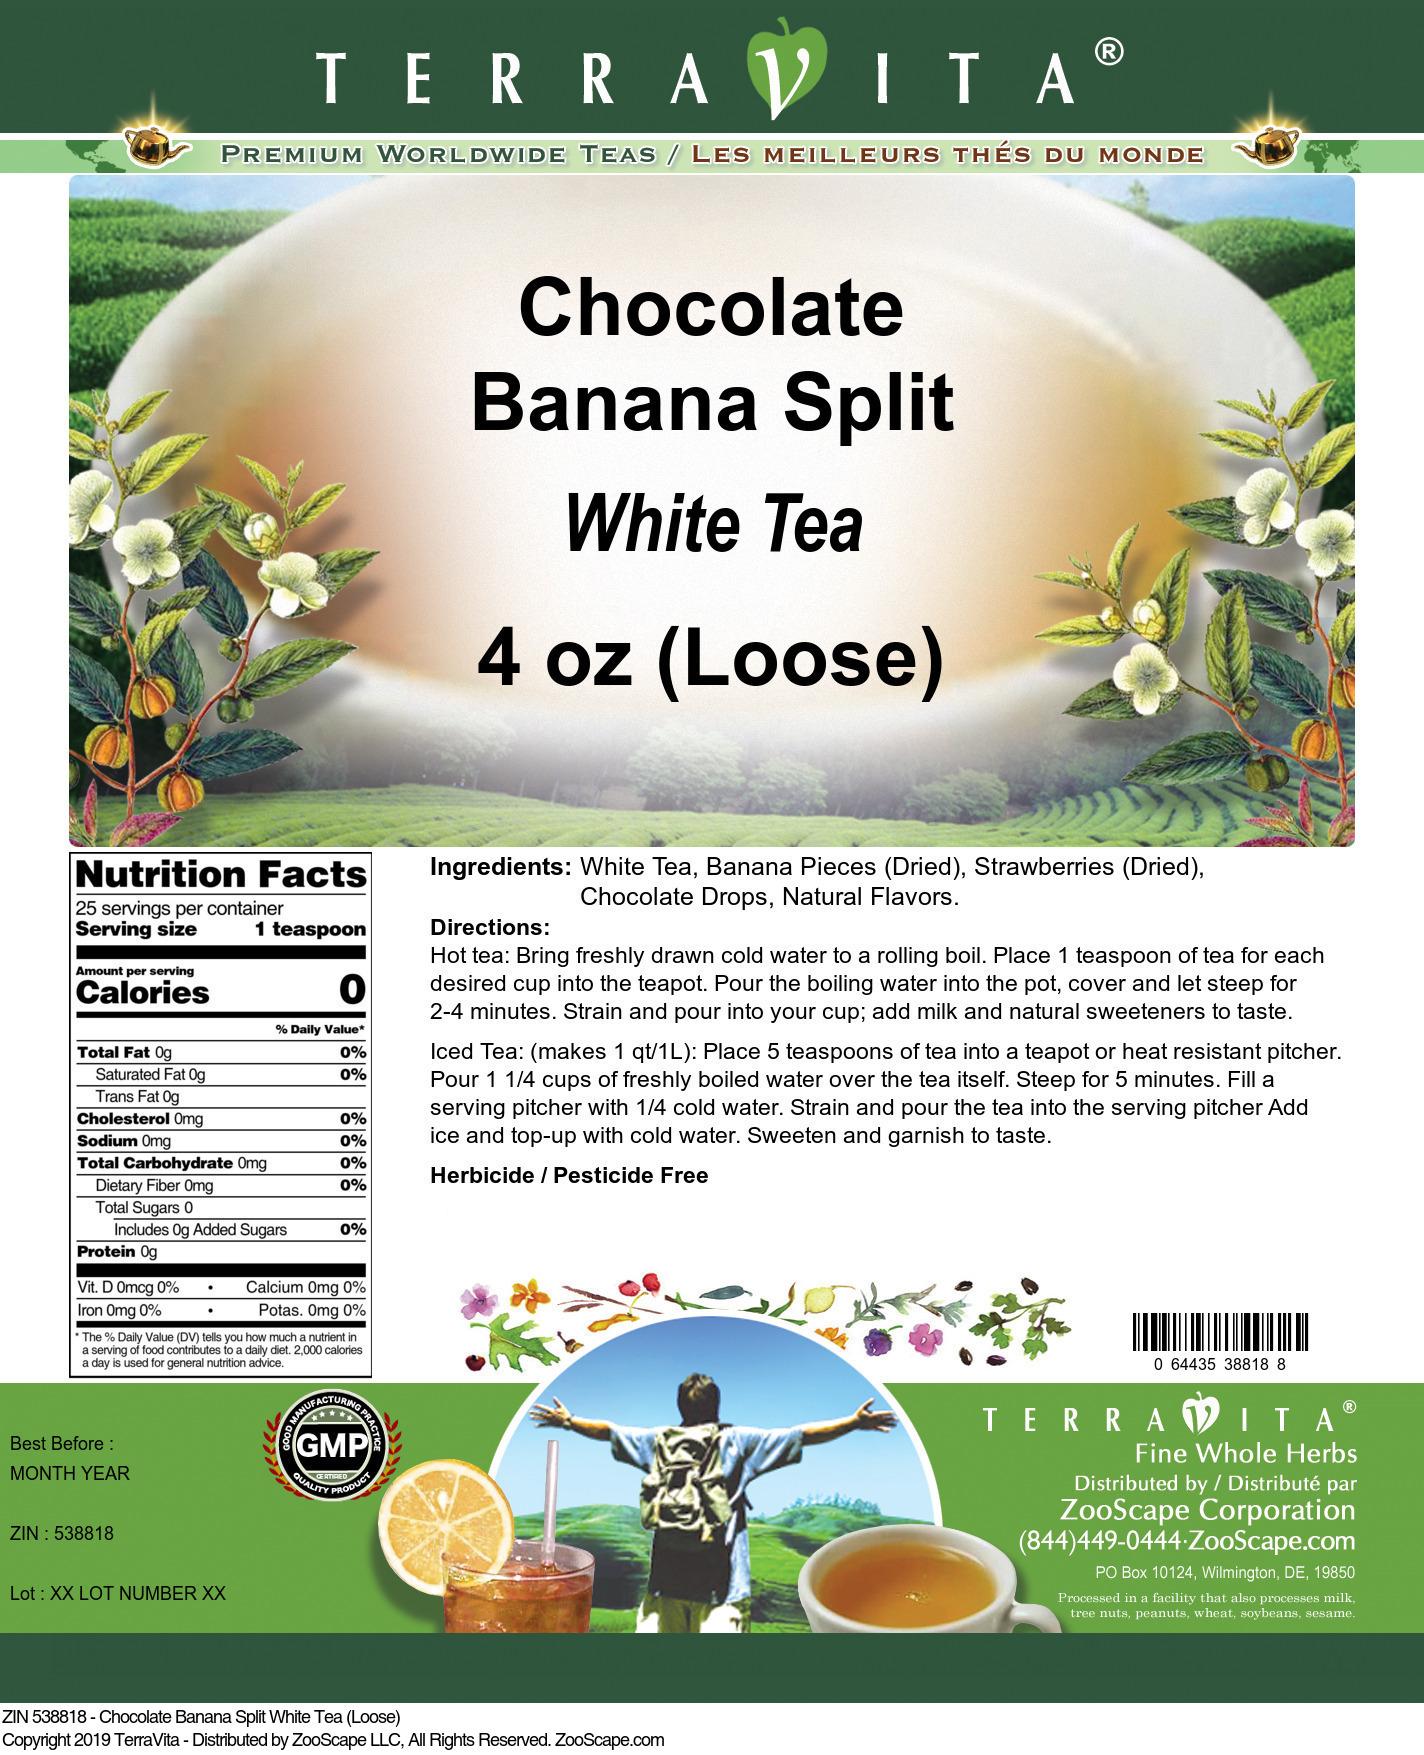 Chocolate Banana Split White Tea (Loose)